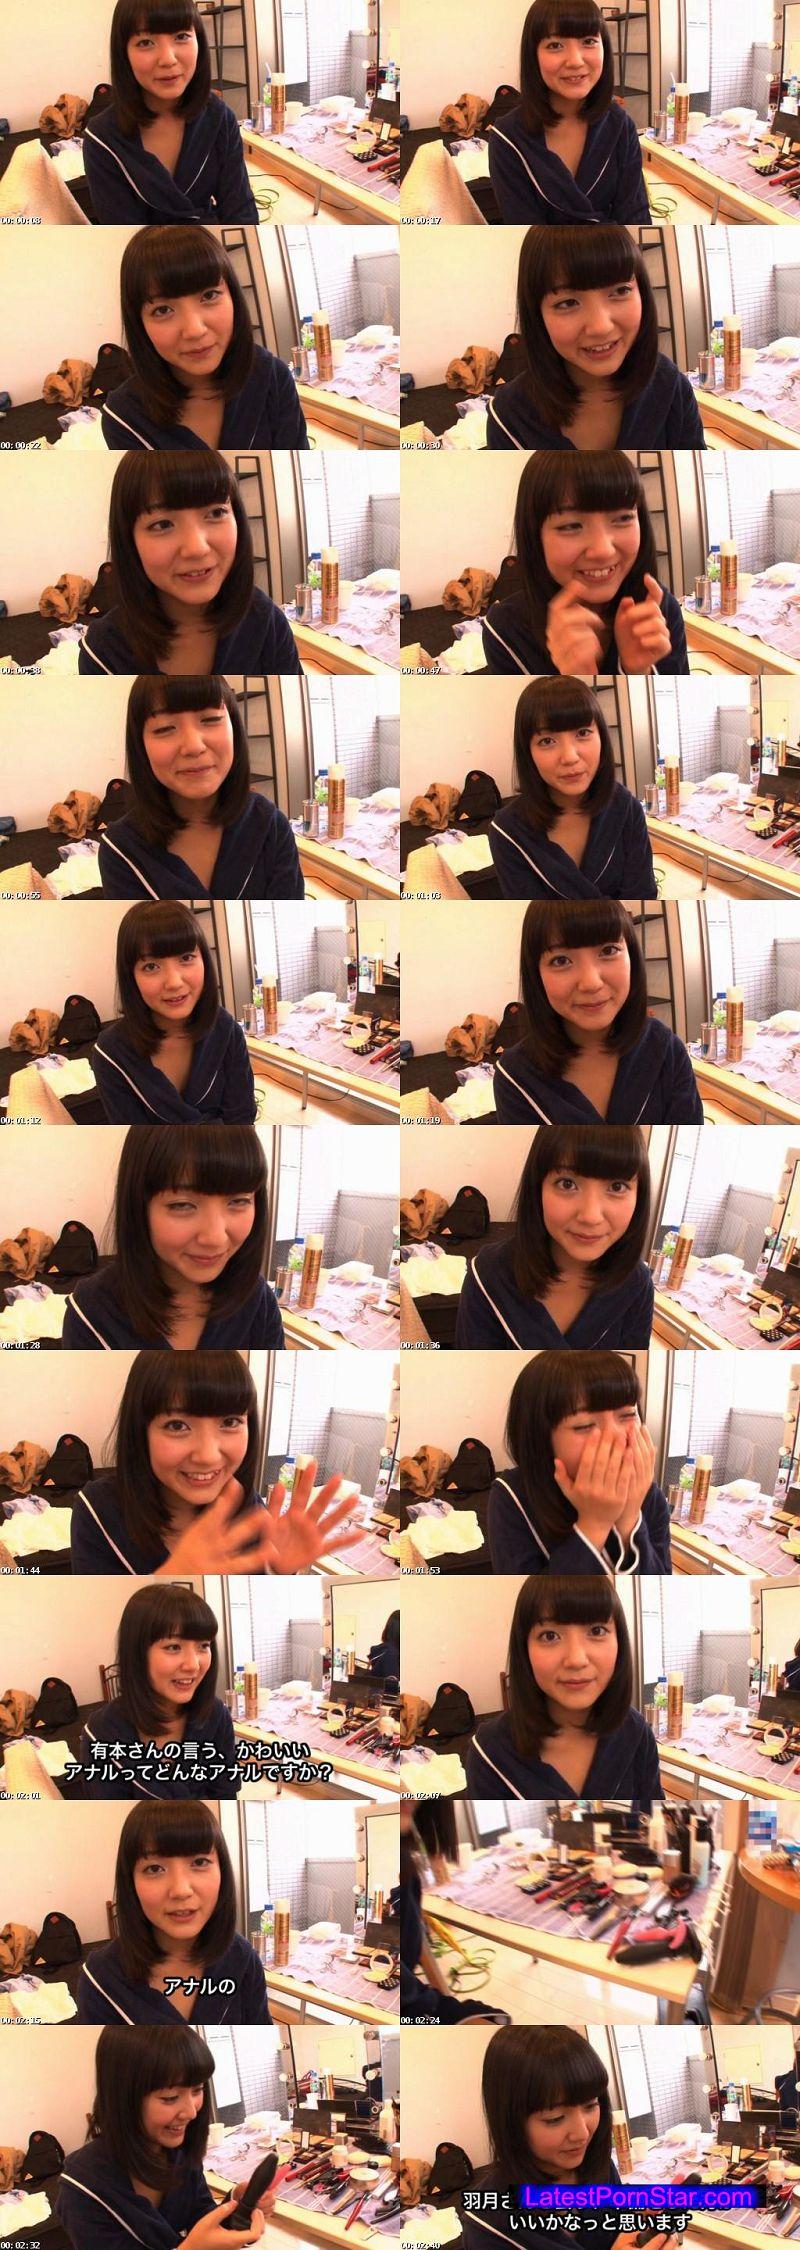 [LZAN-001] アナルぴくぴくレズビアン 羽月希 有本紗世